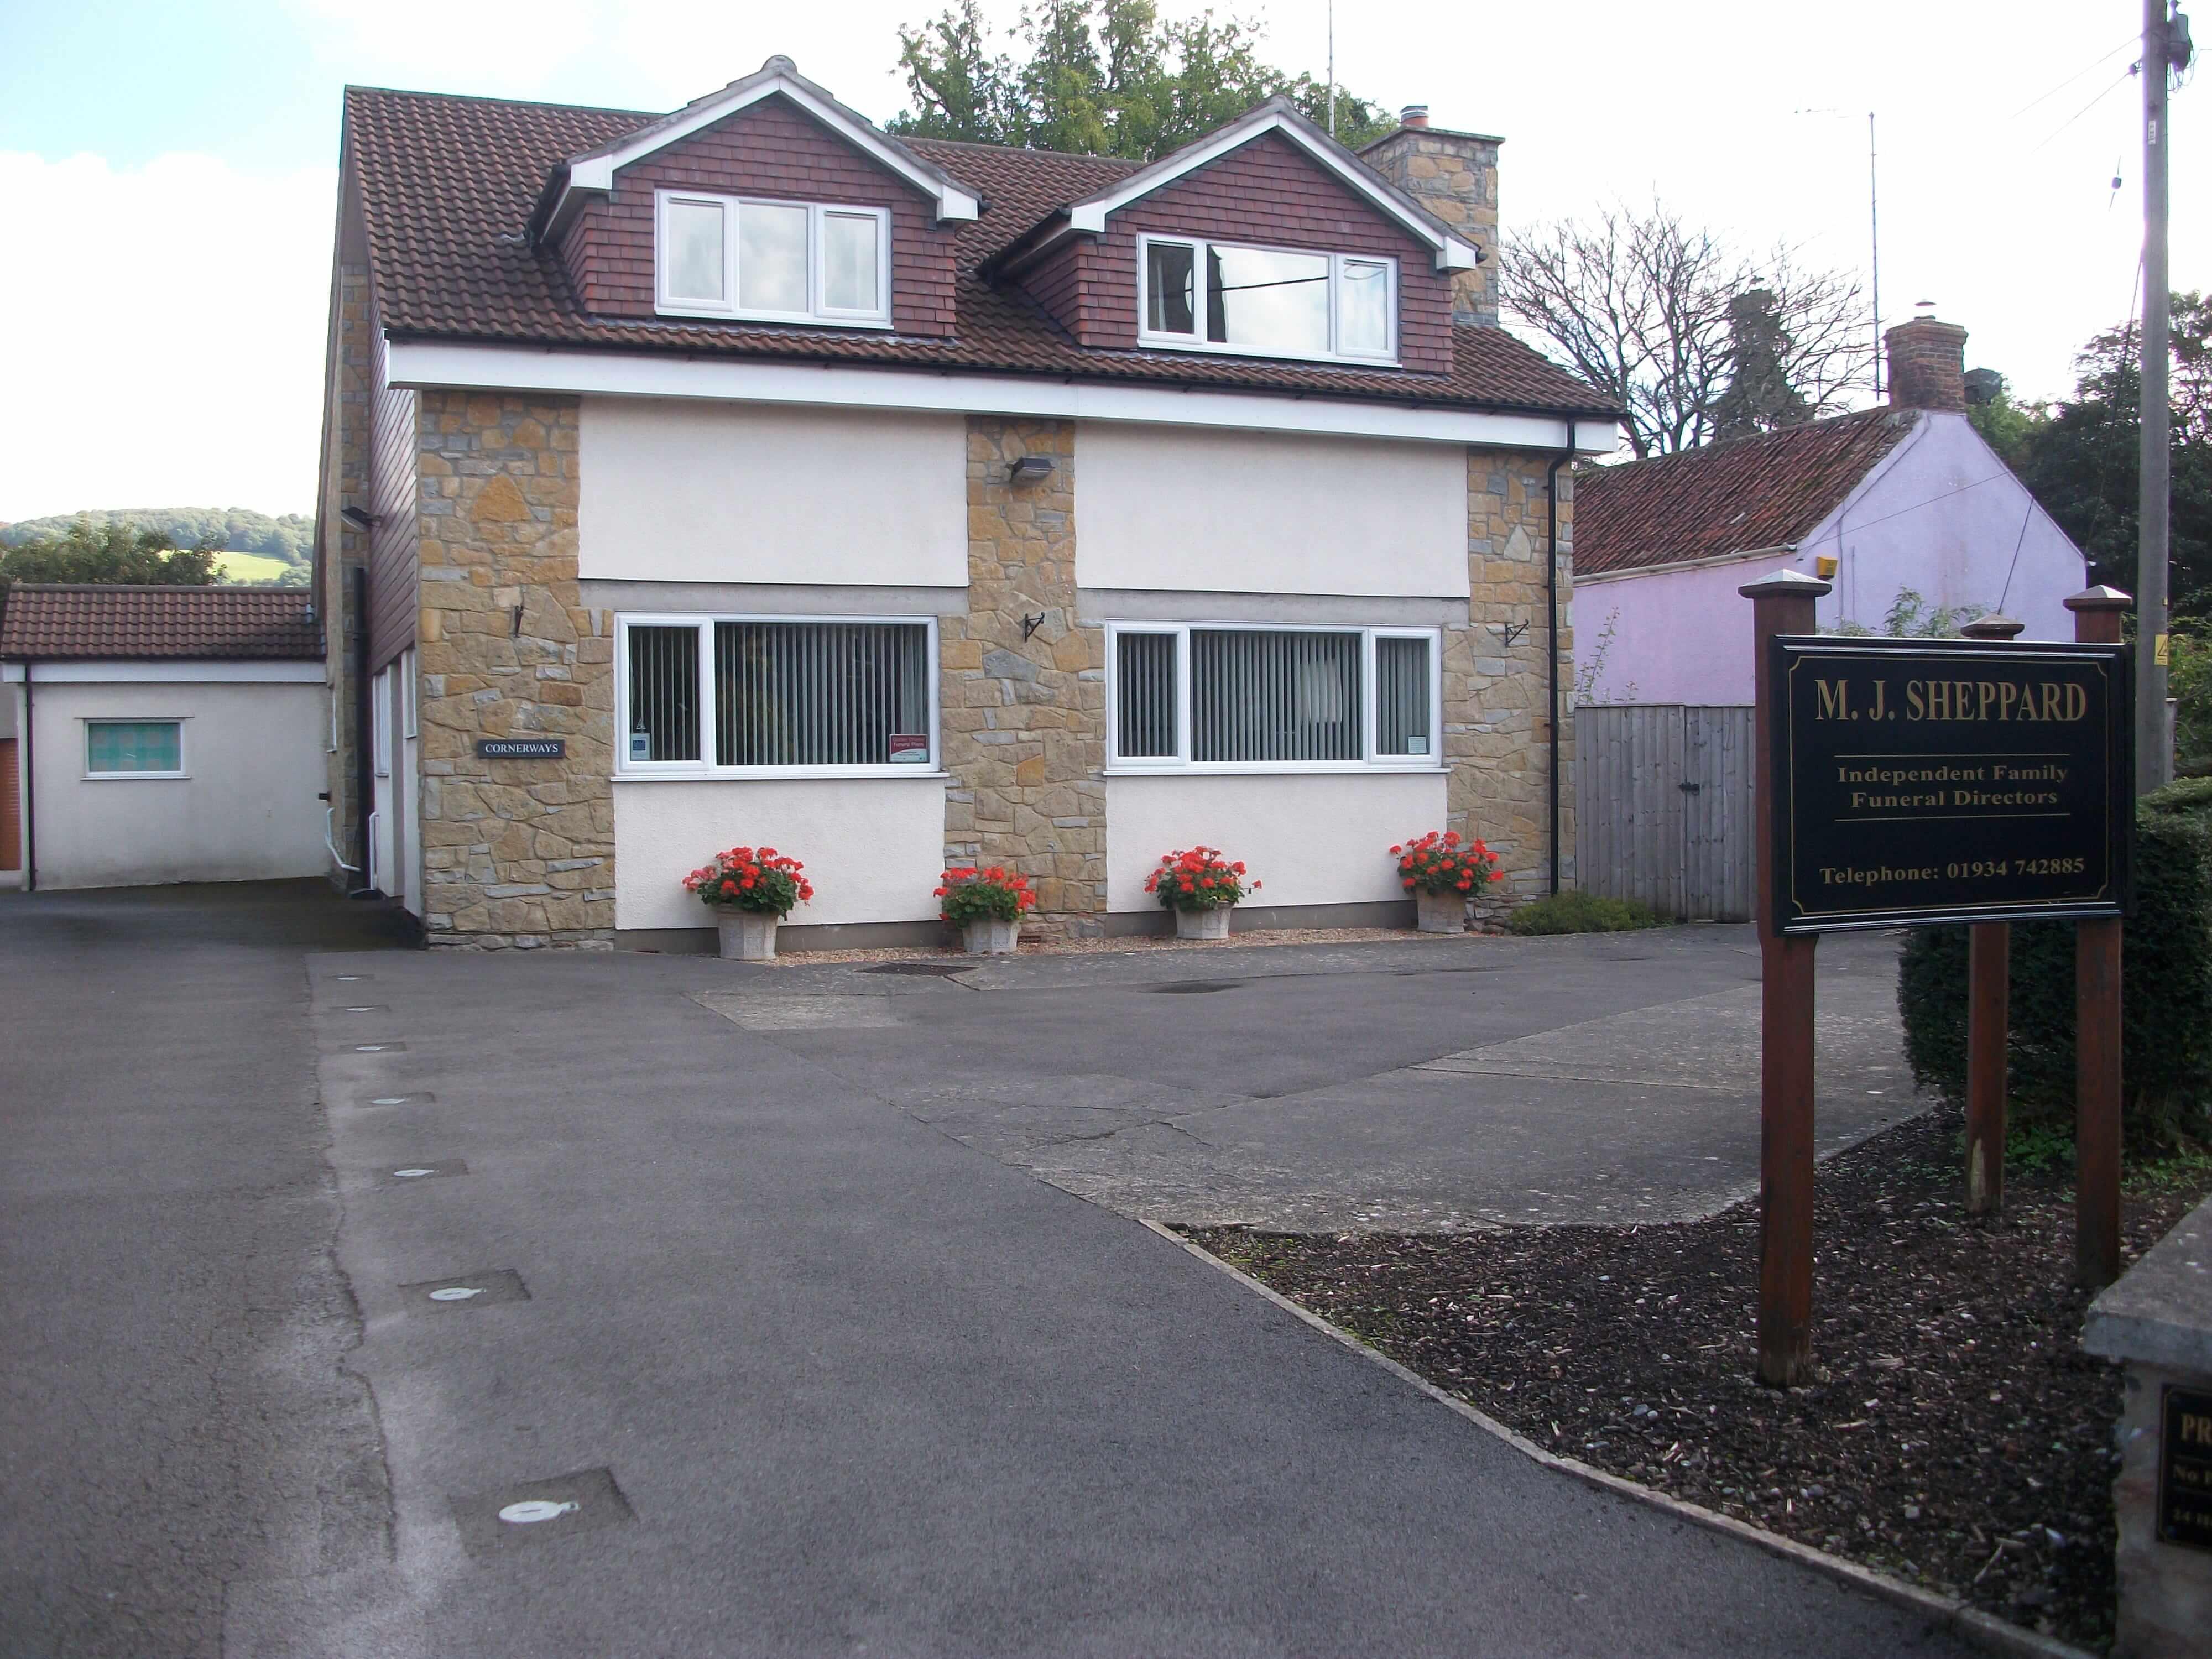 MJ Sheppard Funeral Directors in Cheddar, Somerset - MJS